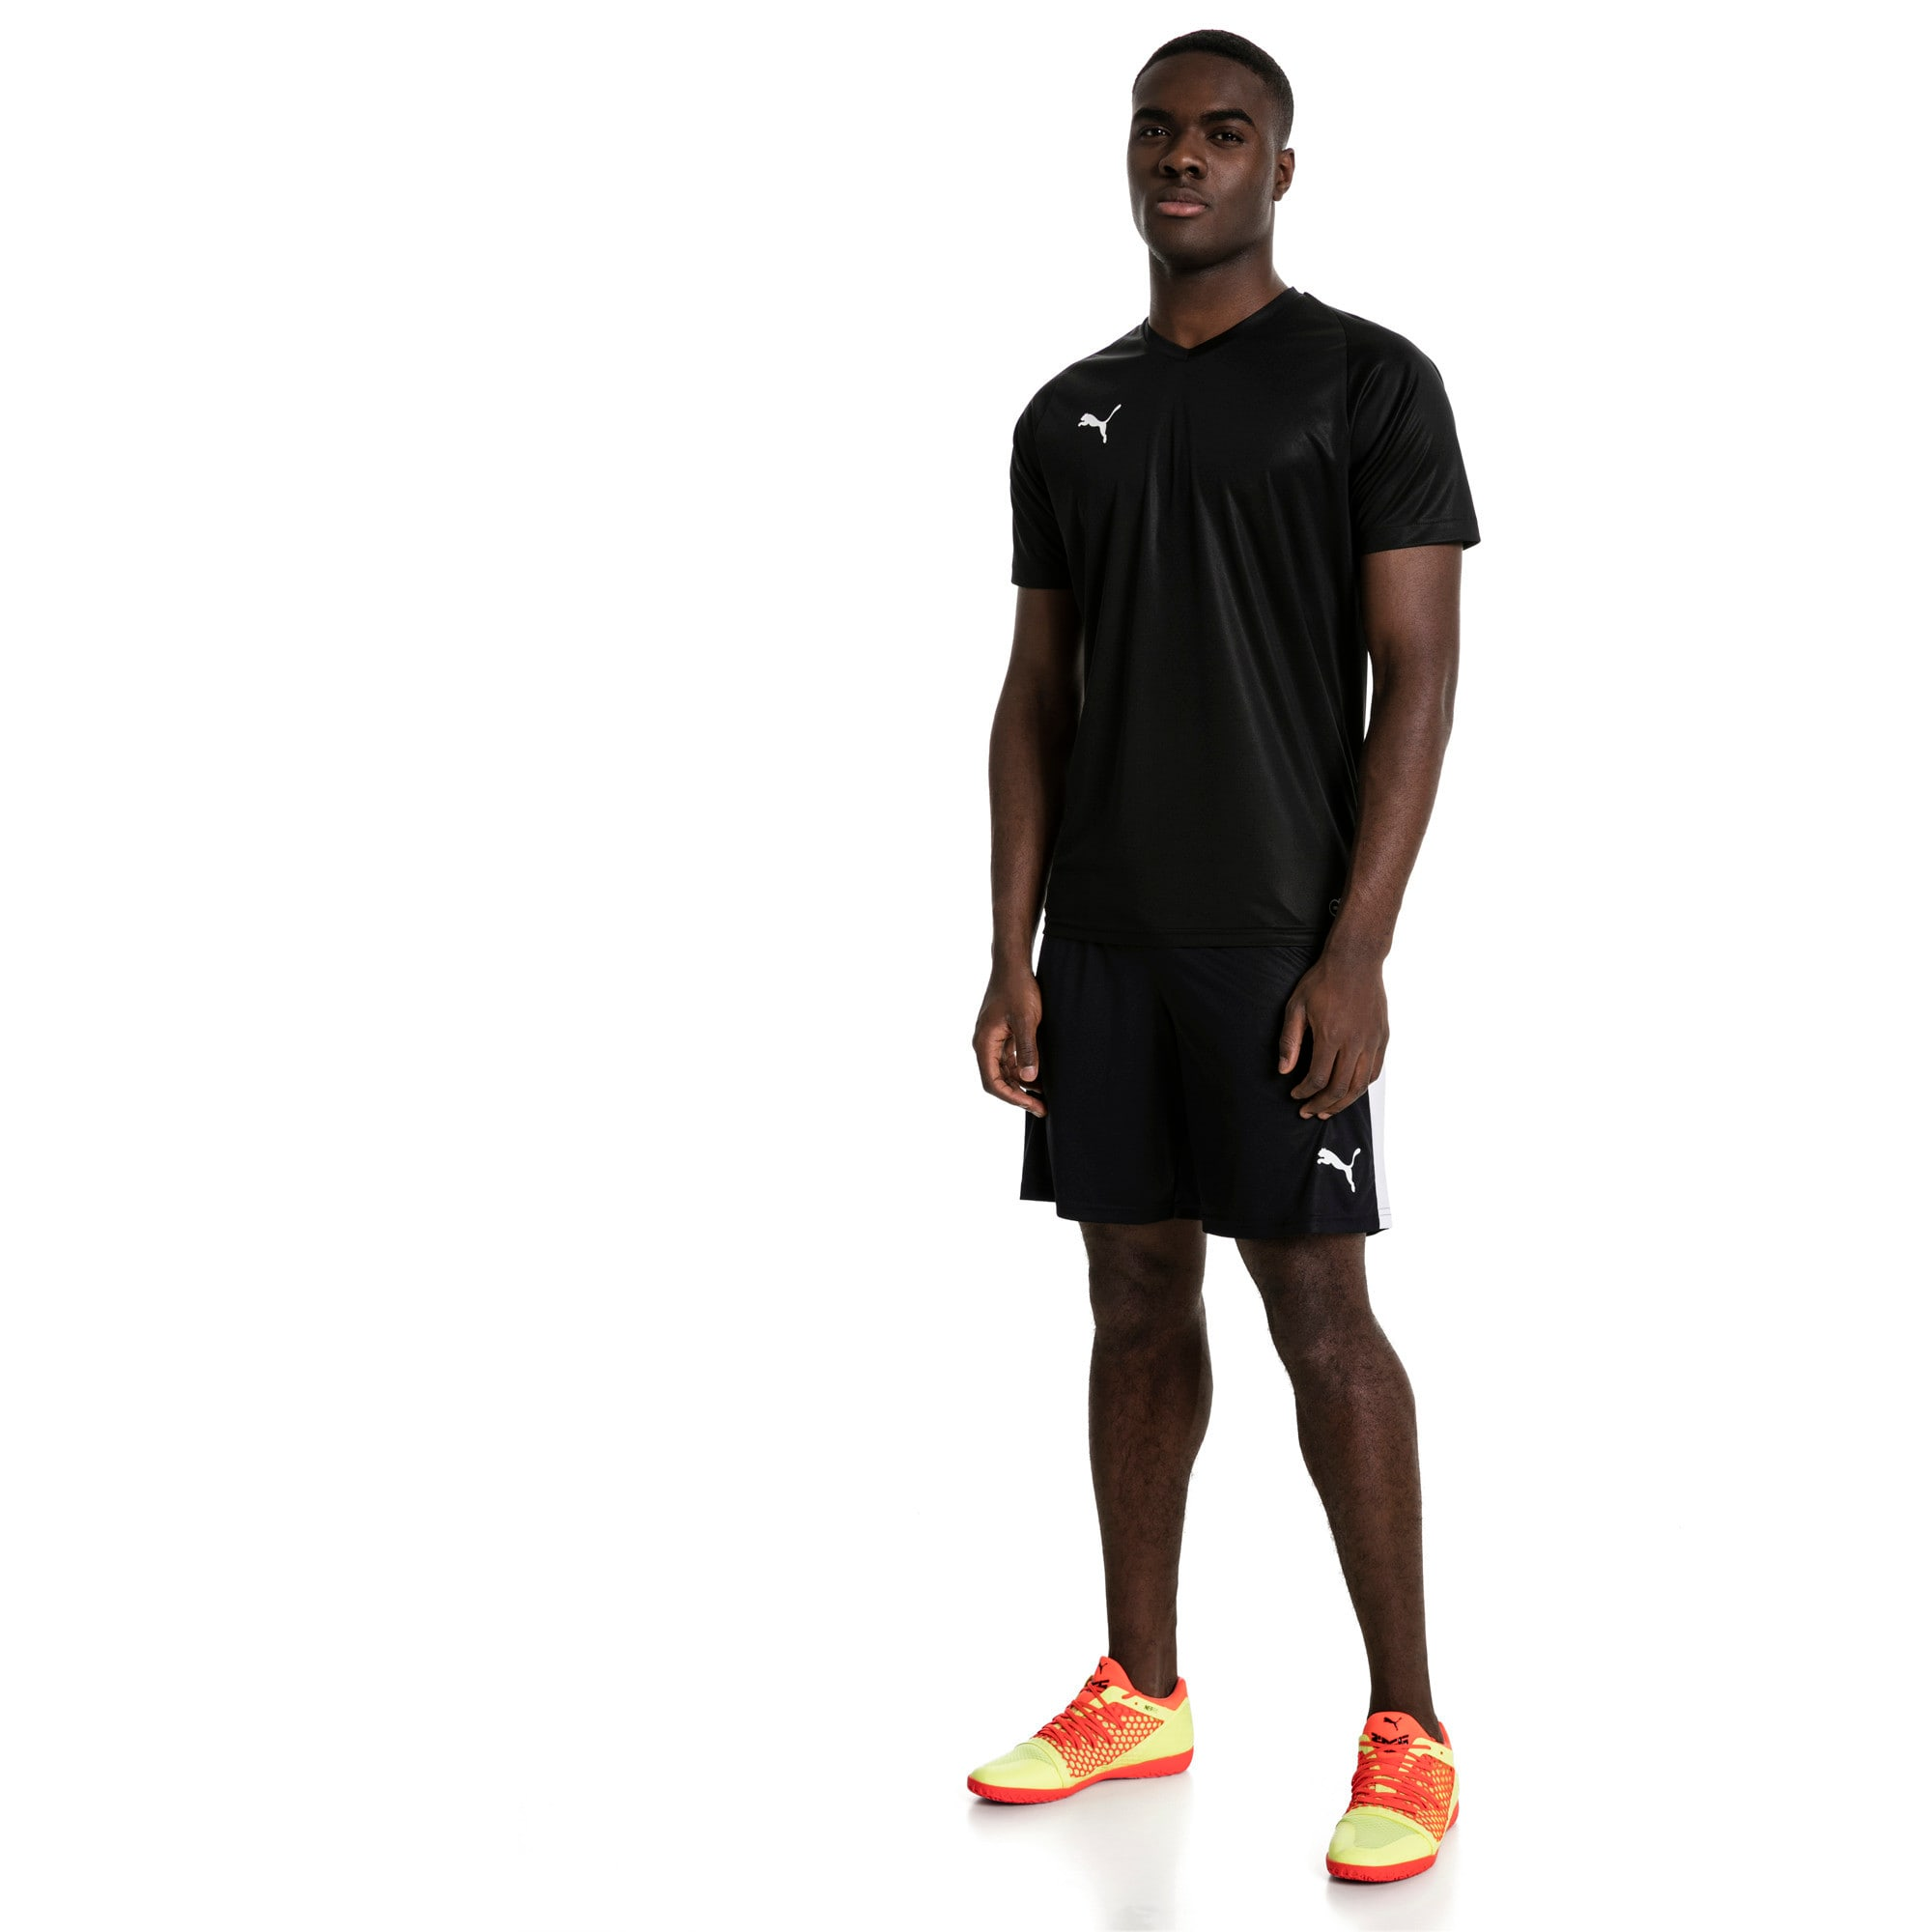 Thumbnail 5 of Liga Men's Shorts, Puma Black-Puma White, medium